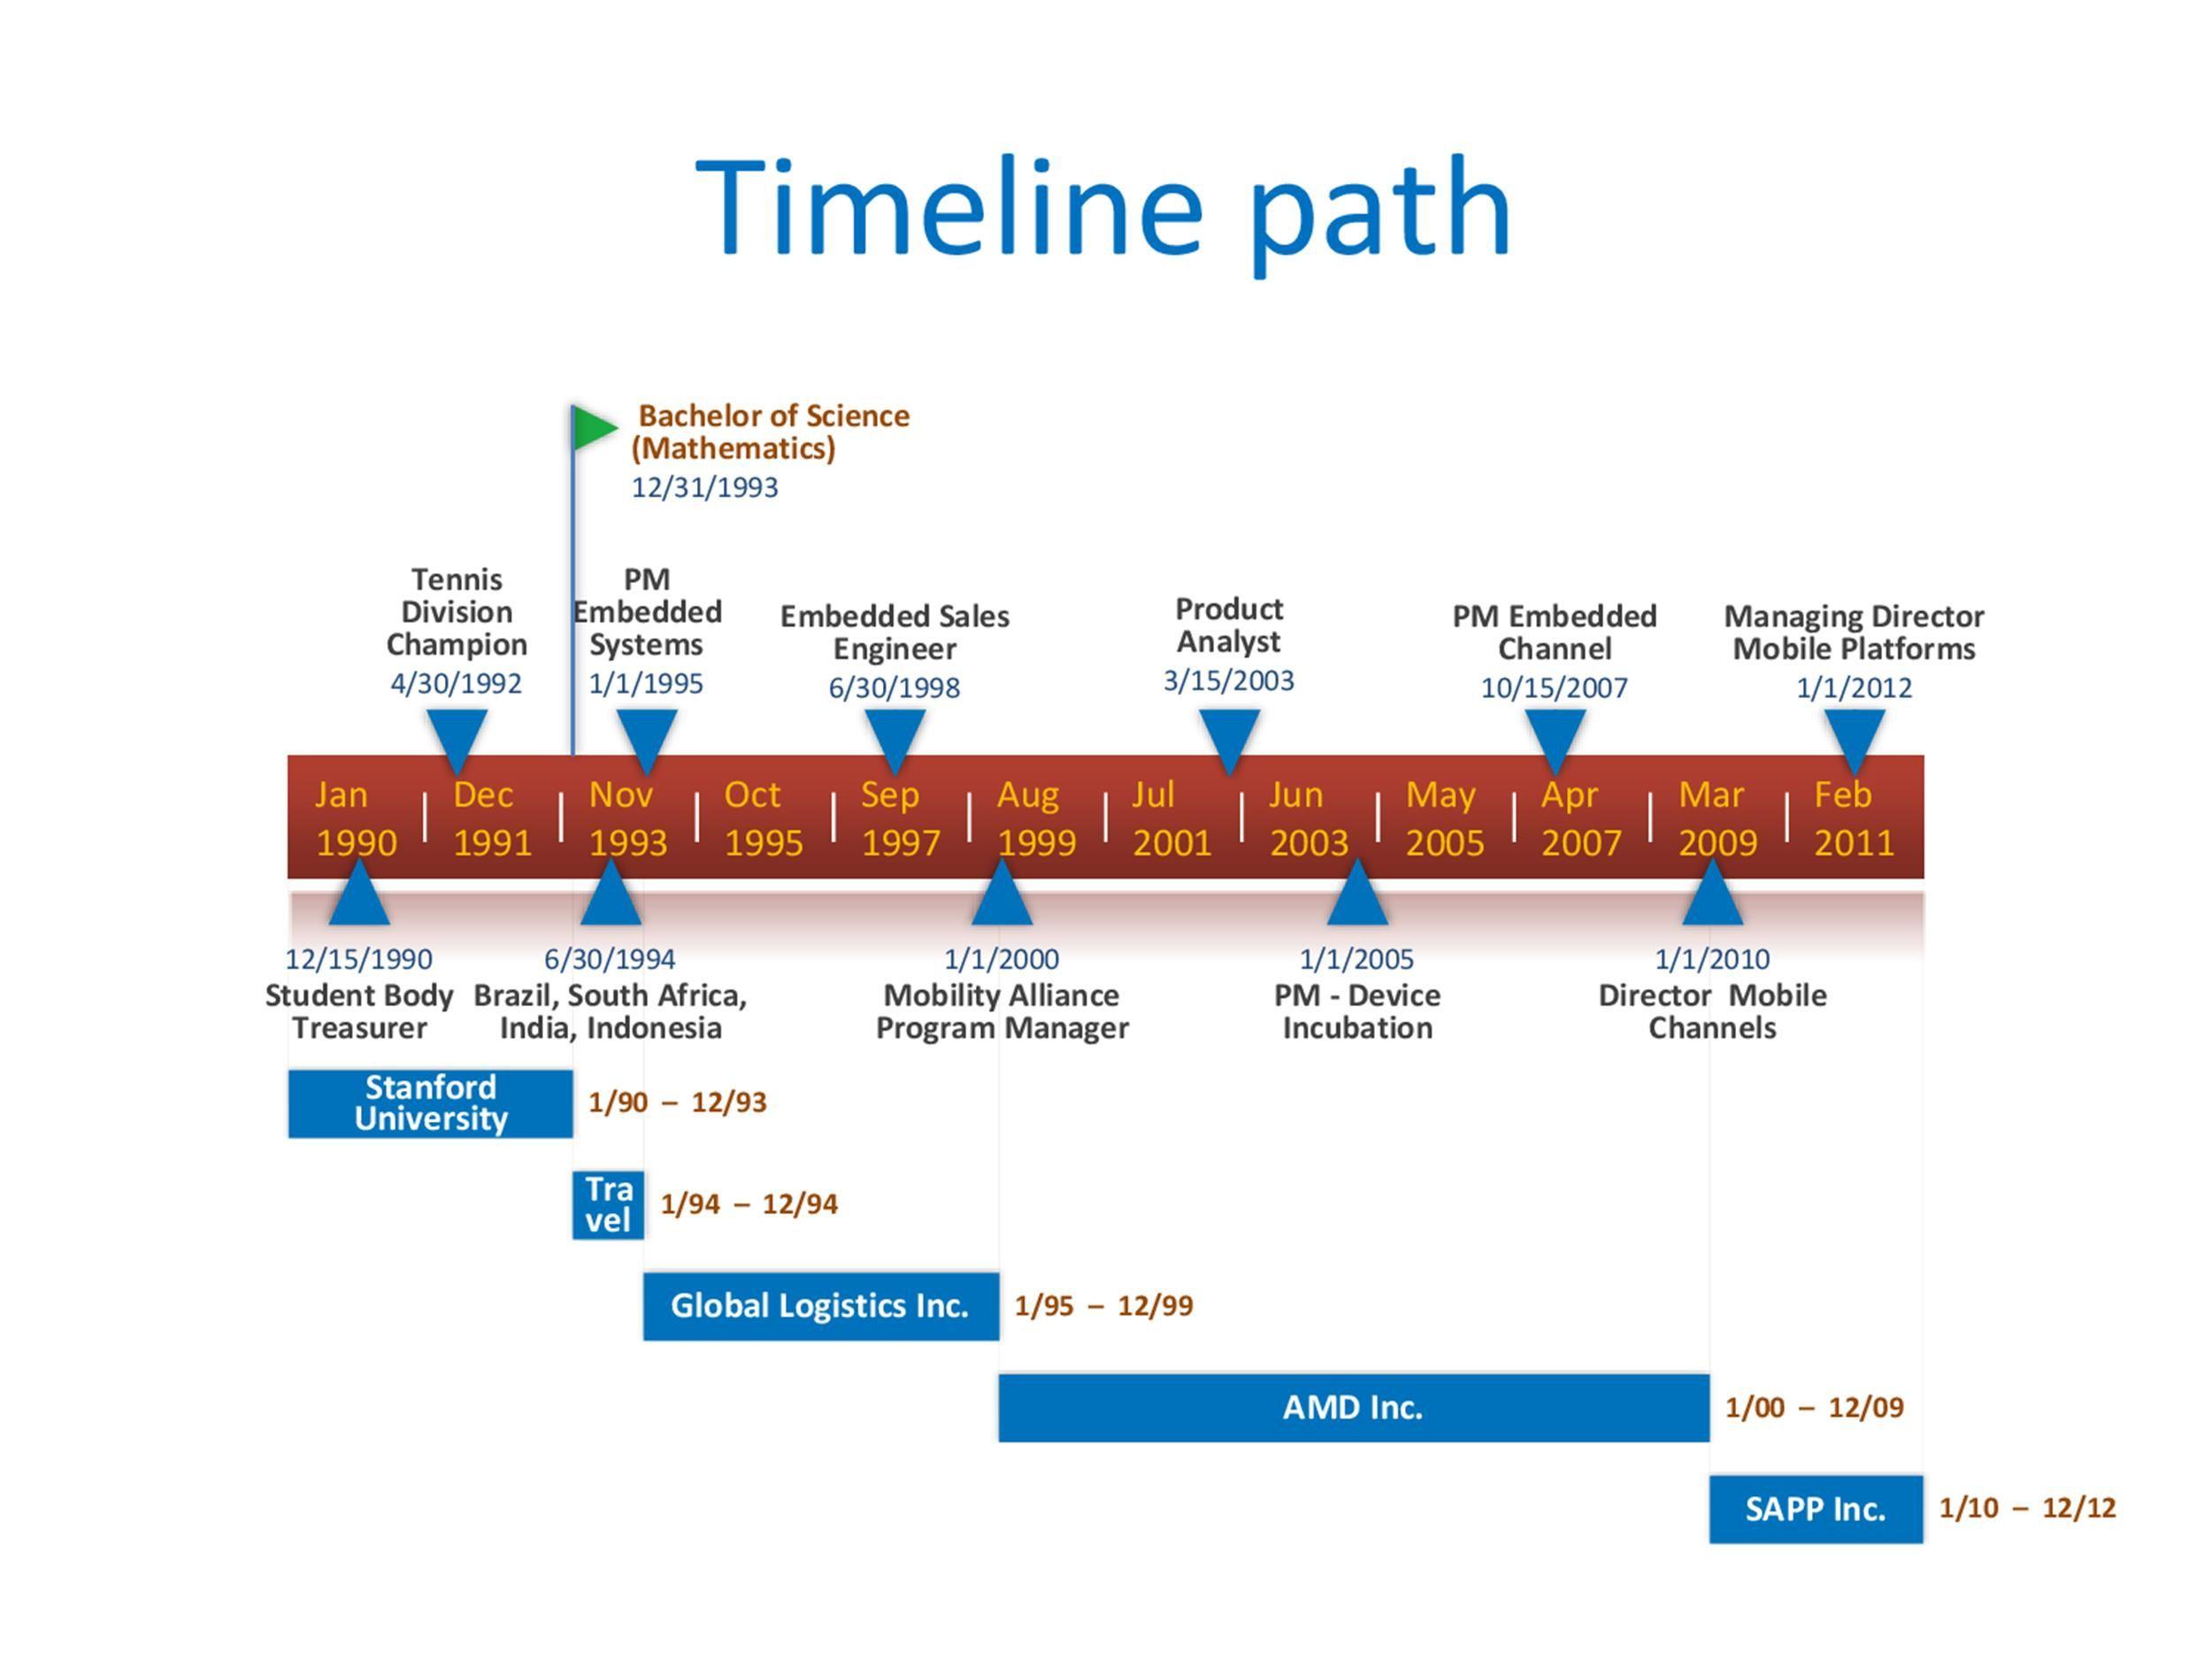 008 Fascinating Timeline Template For Word Inspiration  History DownloadableFull